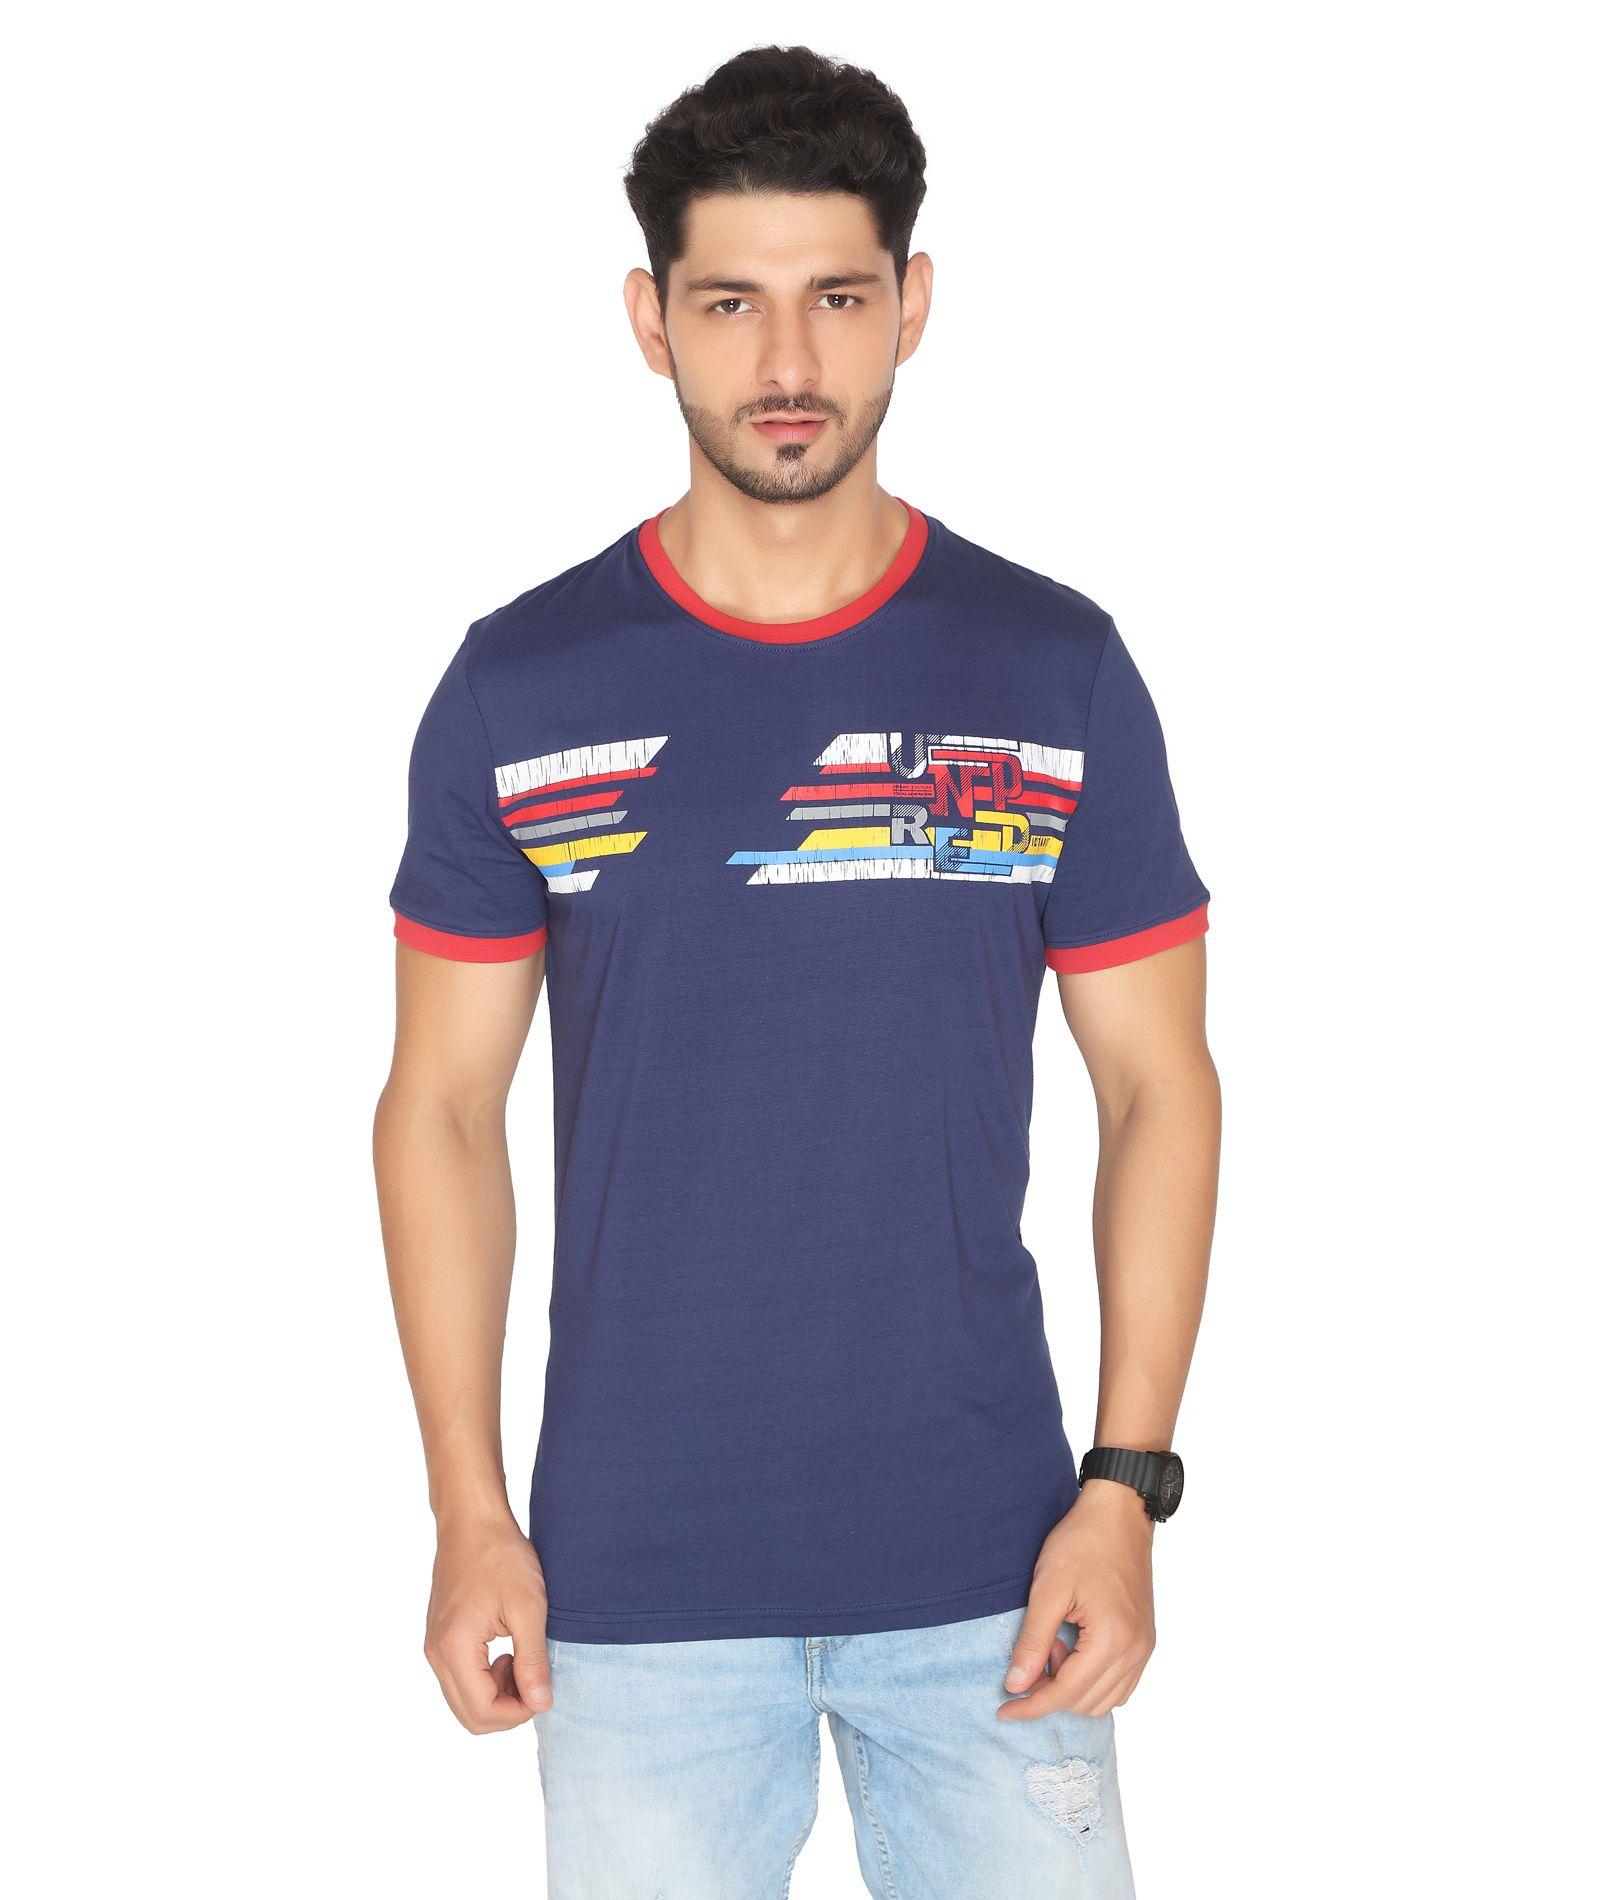 NEXGEN CLUB Cotton Blend Blue Printed T-Shirt